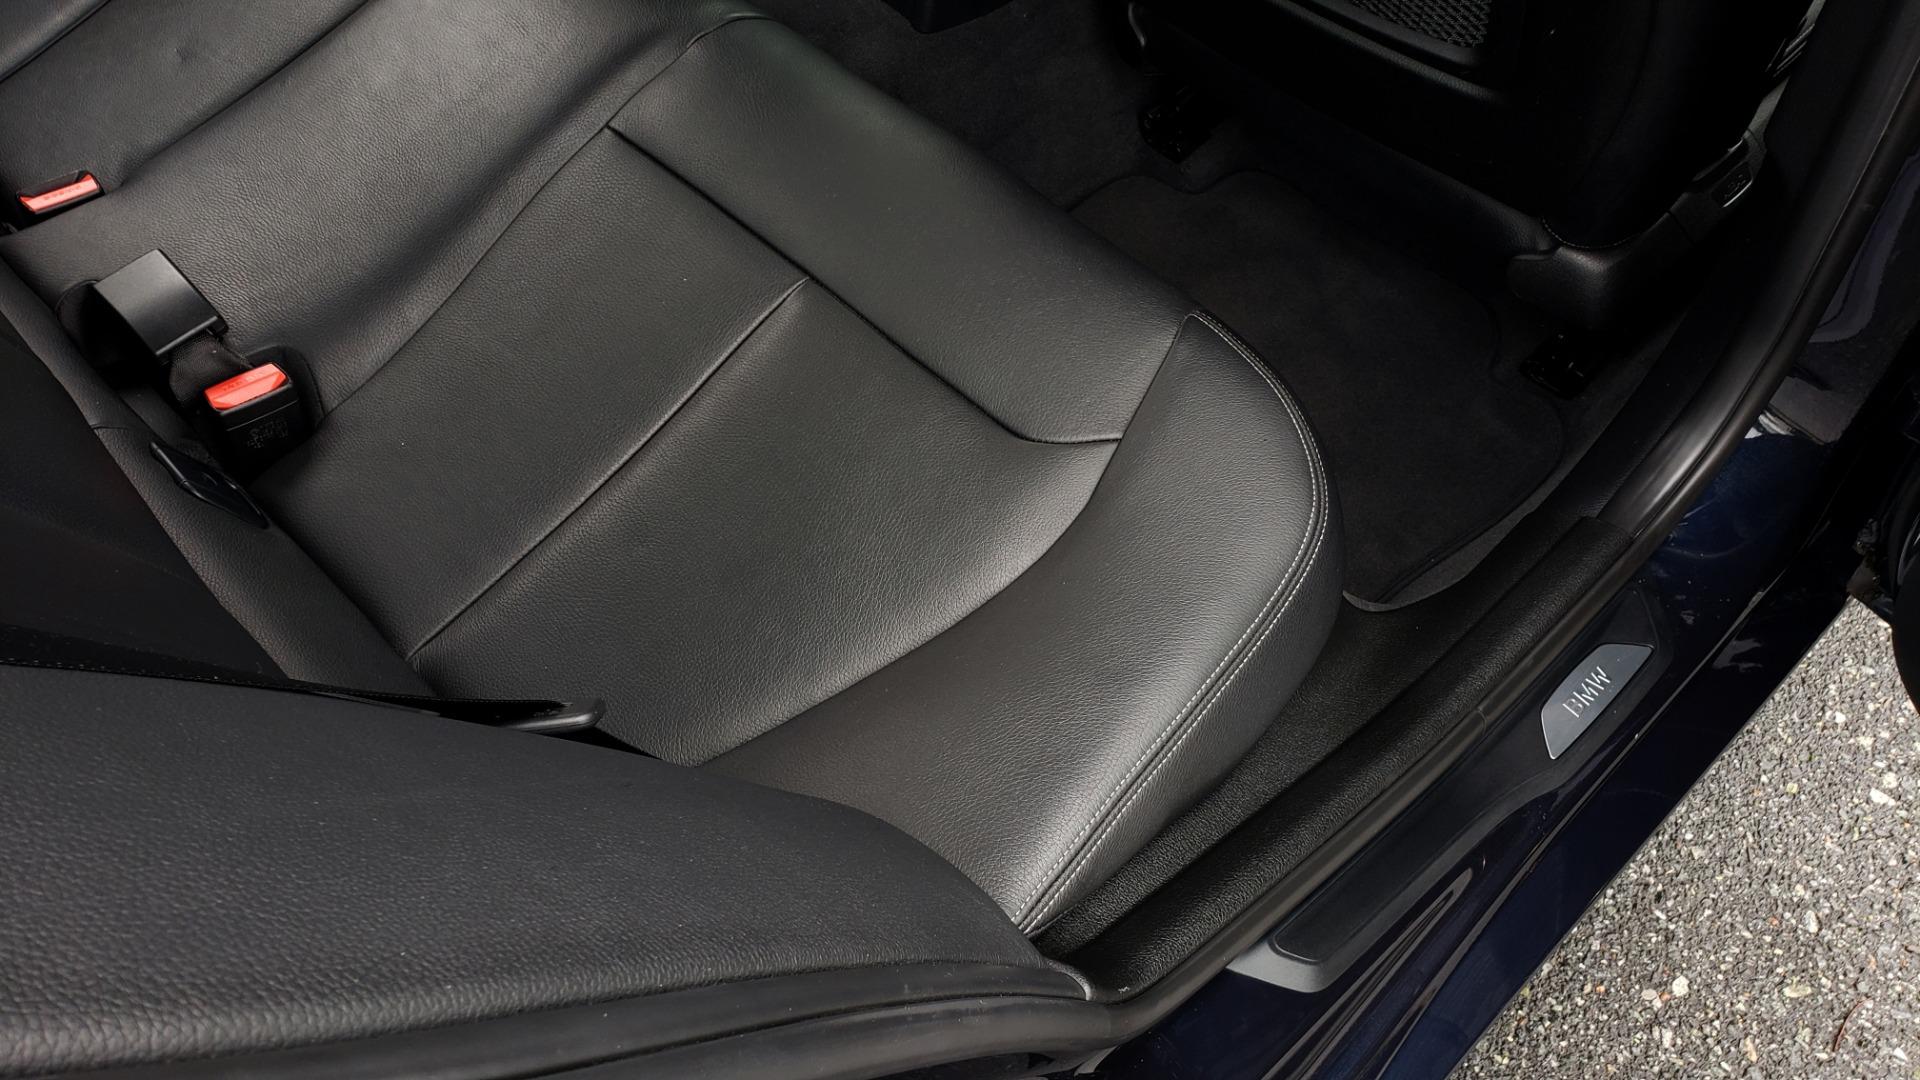 Used 2016 BMW 3 SERIES 328I PREMIUM PKG / DRVR ASST / SUNROOF / PARK ASST for sale Sold at Formula Imports in Charlotte NC 28227 66